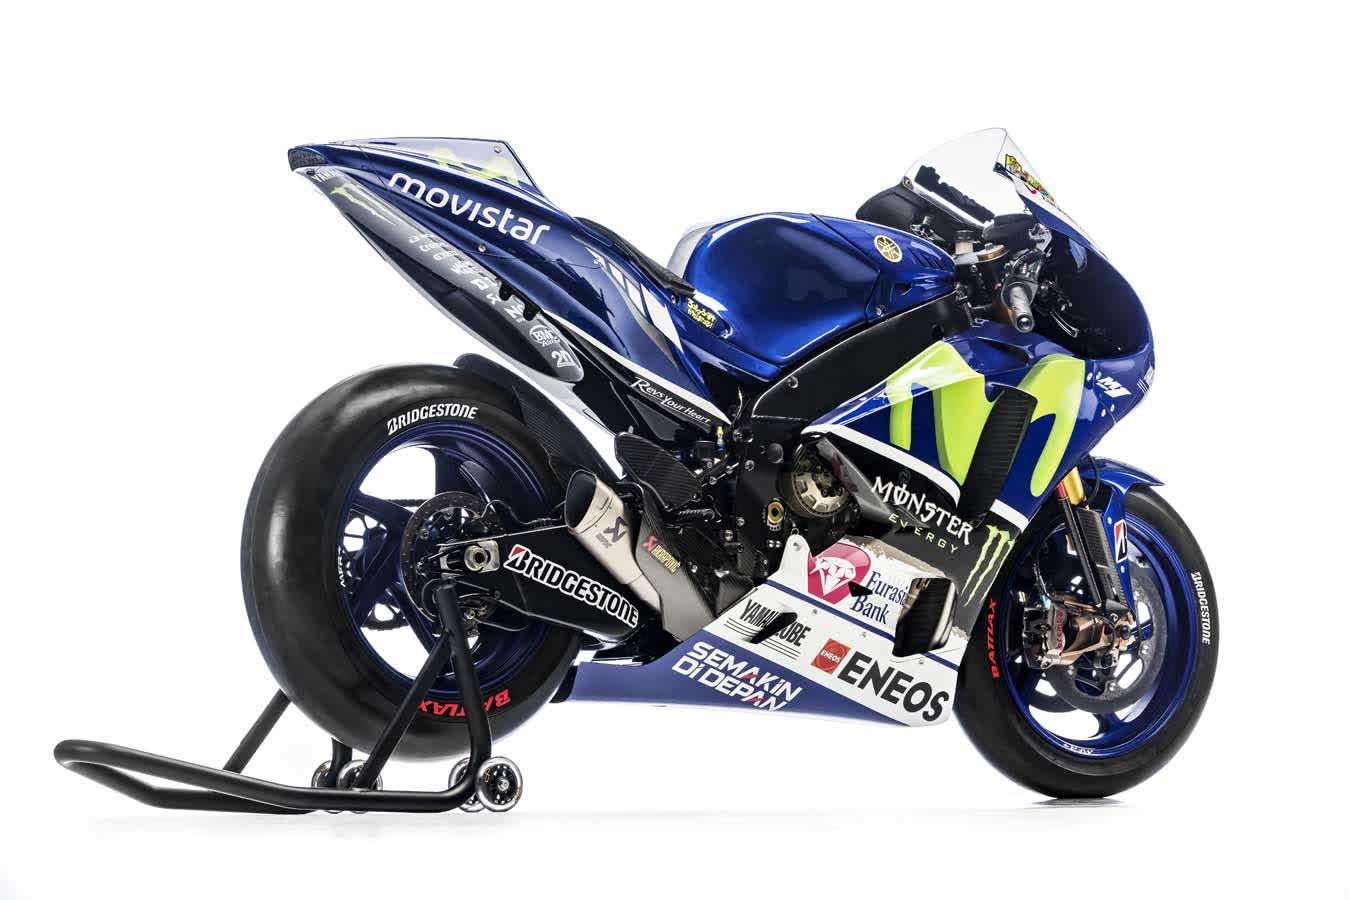 Yamaha M1 2015 exedy